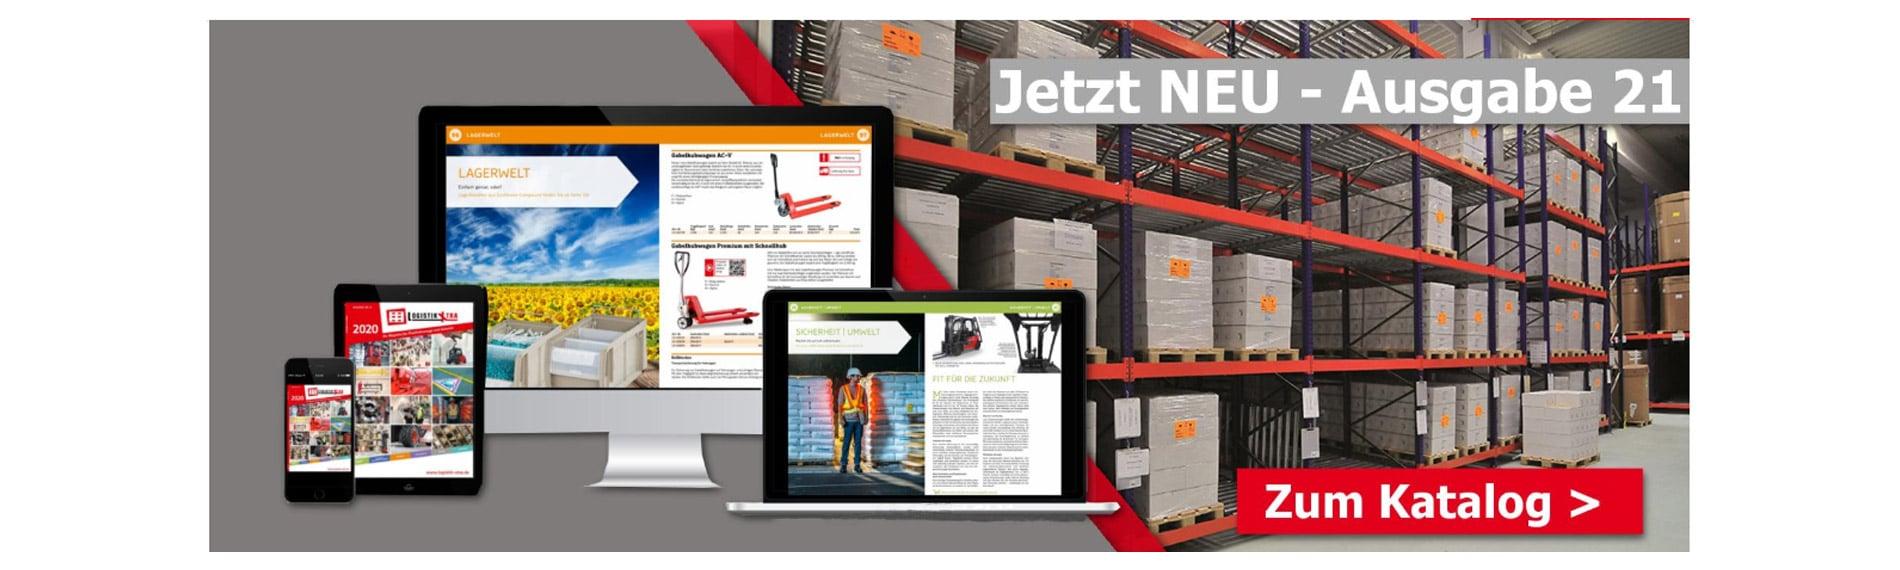 logistik x tra neue ausgabe 21 katalog